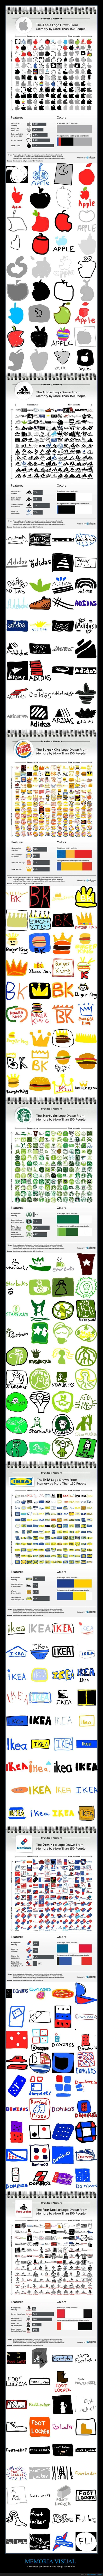 dibujar,logos,marcas,memoria